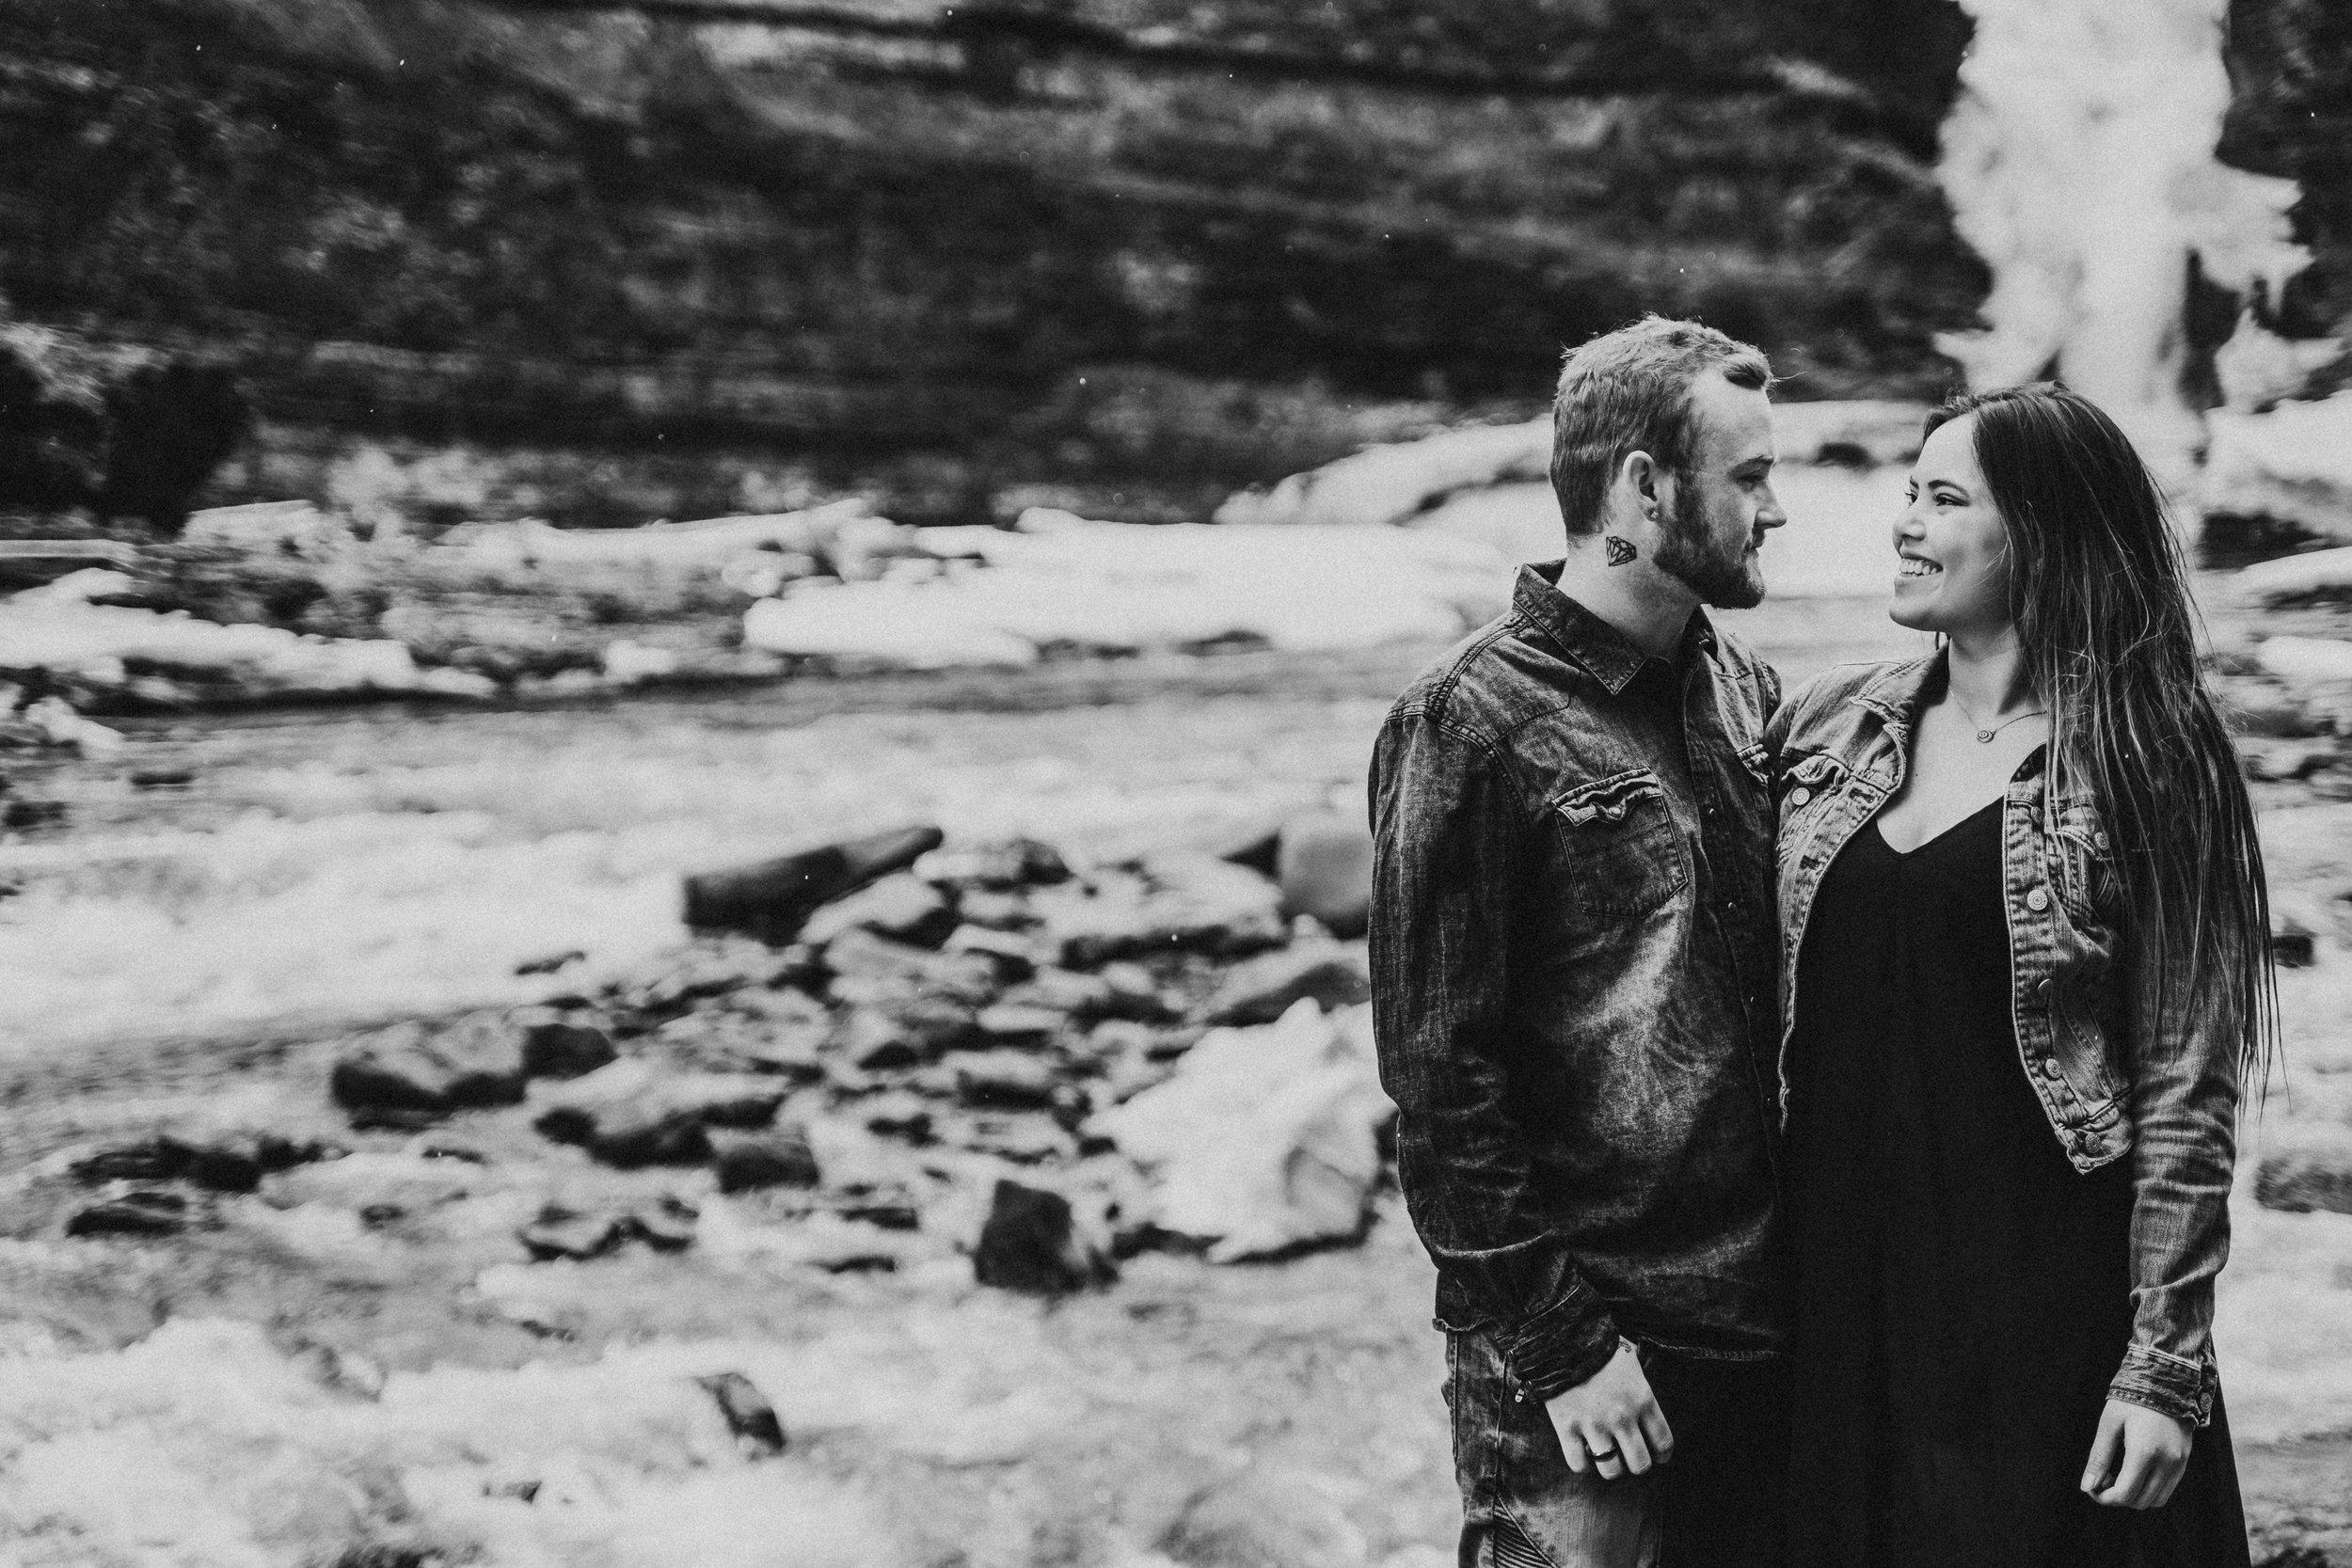 tyraephotography_photographer_wedding_elopement_engagement_photography-04284.jpg